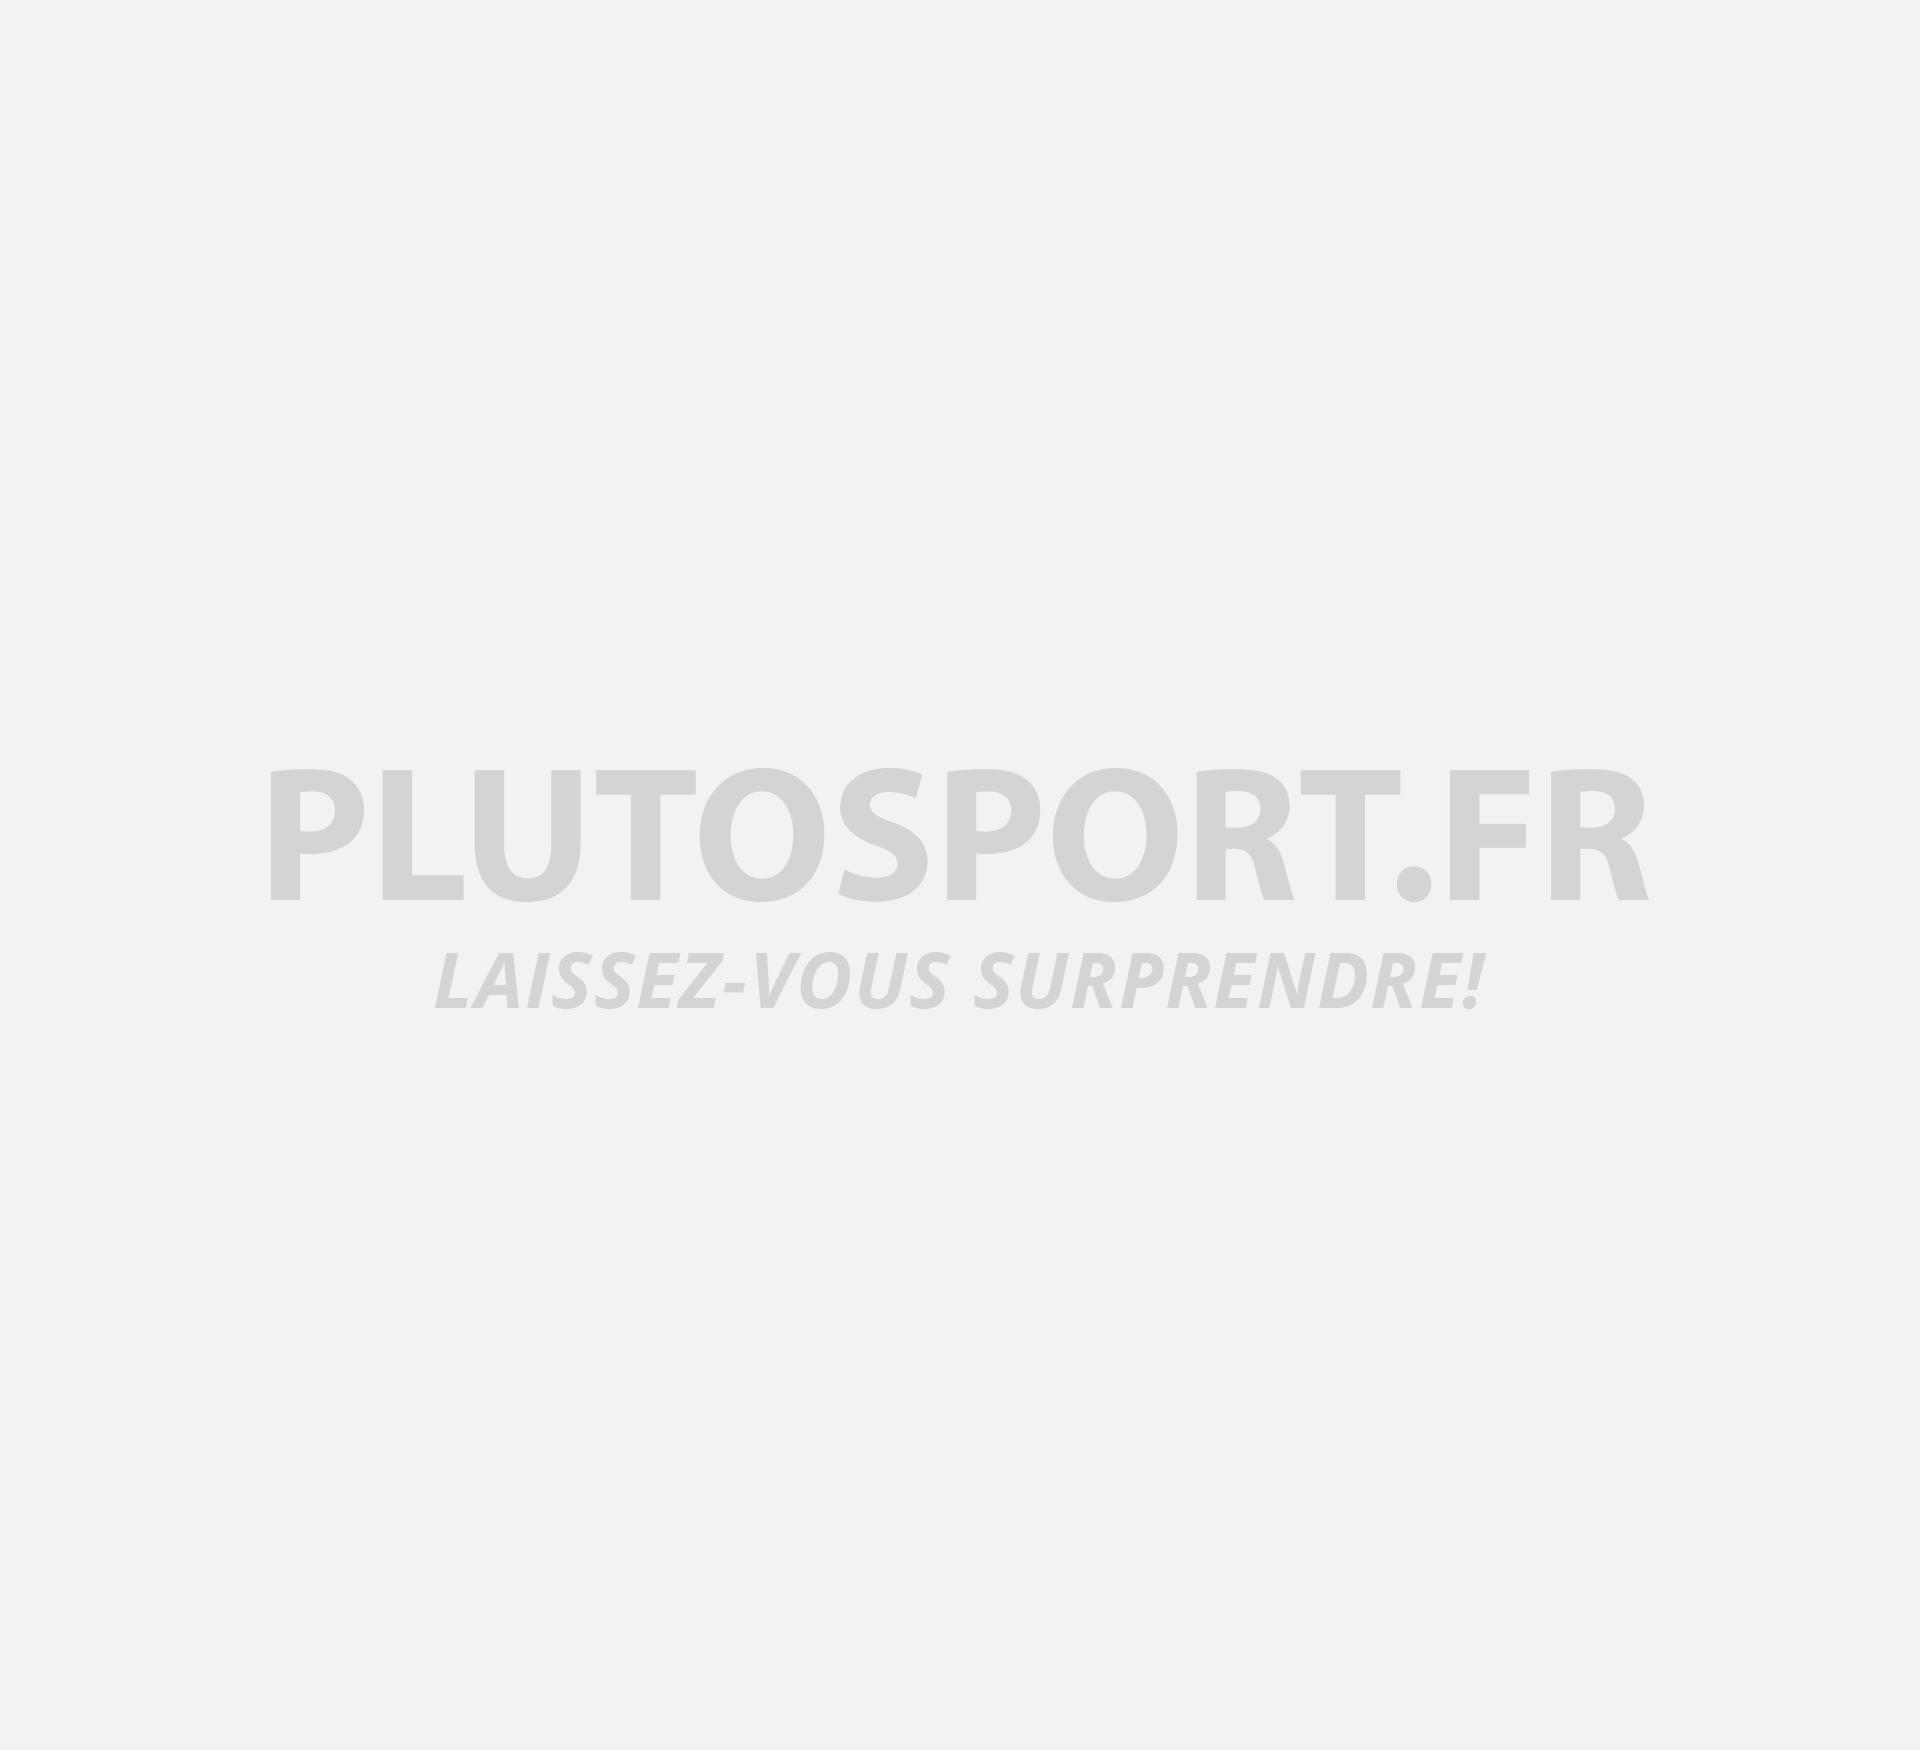 Skechers Og Goldn GurlBaskets Pour 85 Retros Femmes DYWEI9beH2